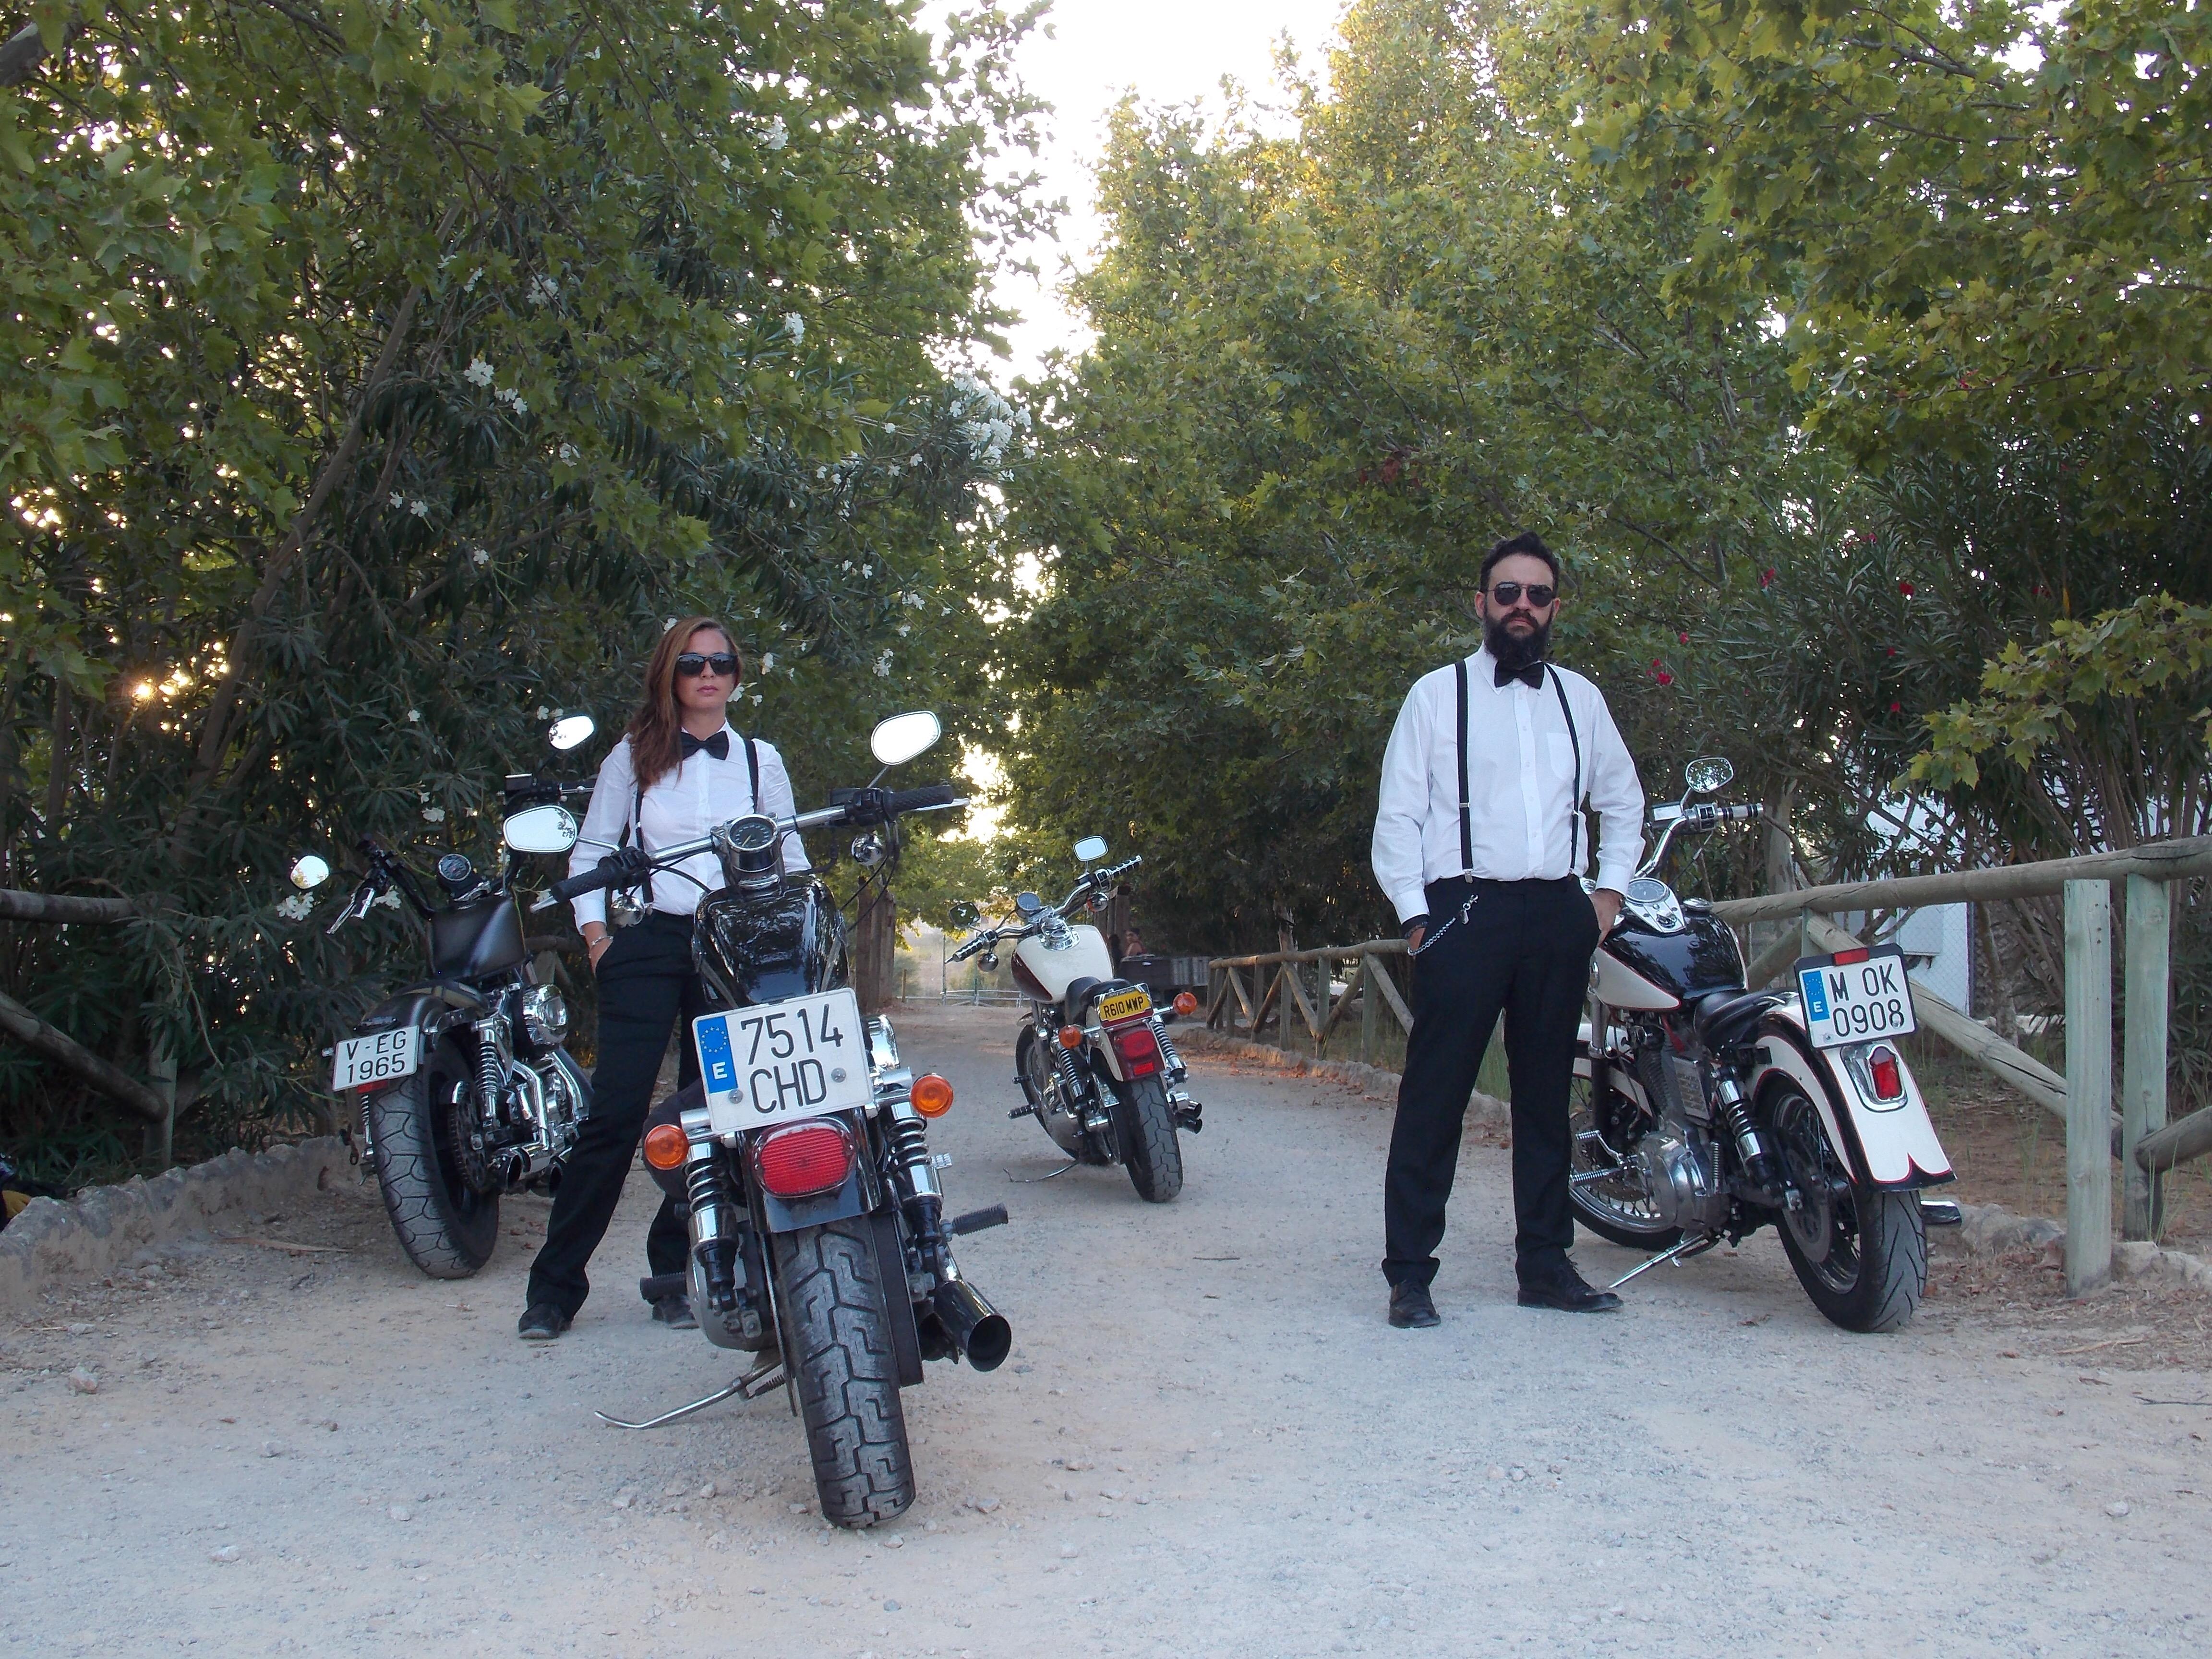 Motos y acompañantes para bodas